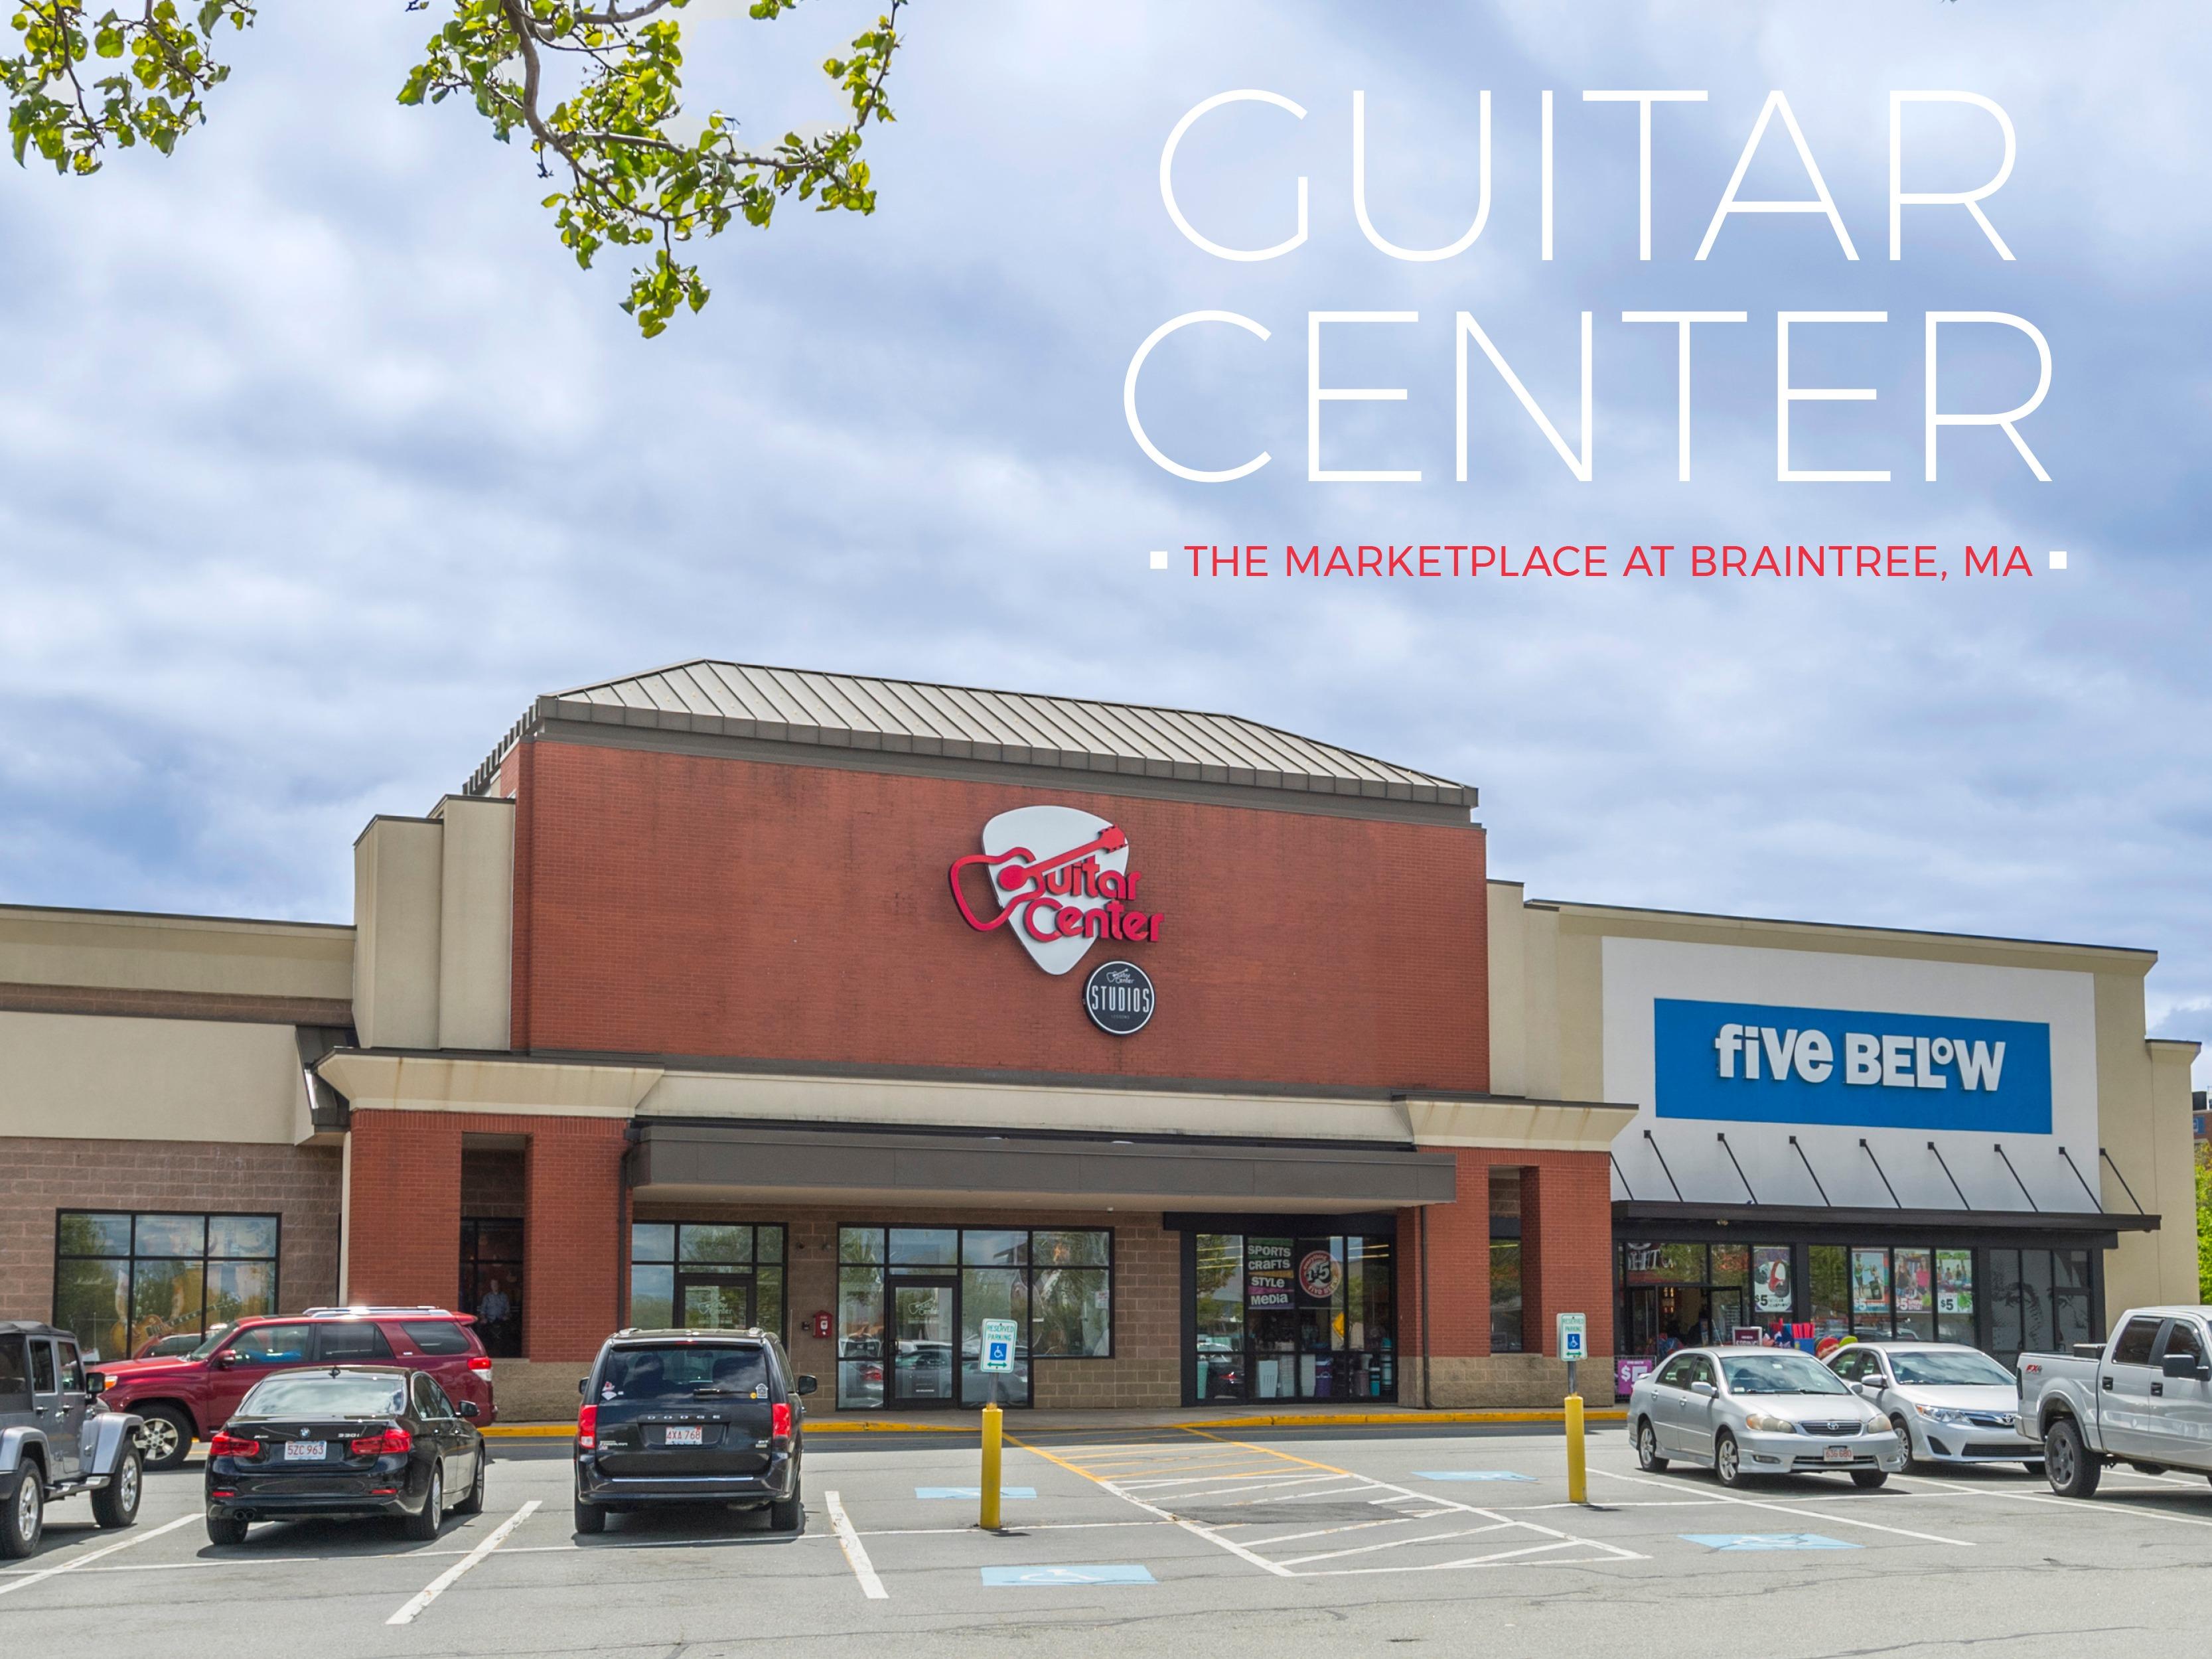 guitar center braintree massachusetts 02184